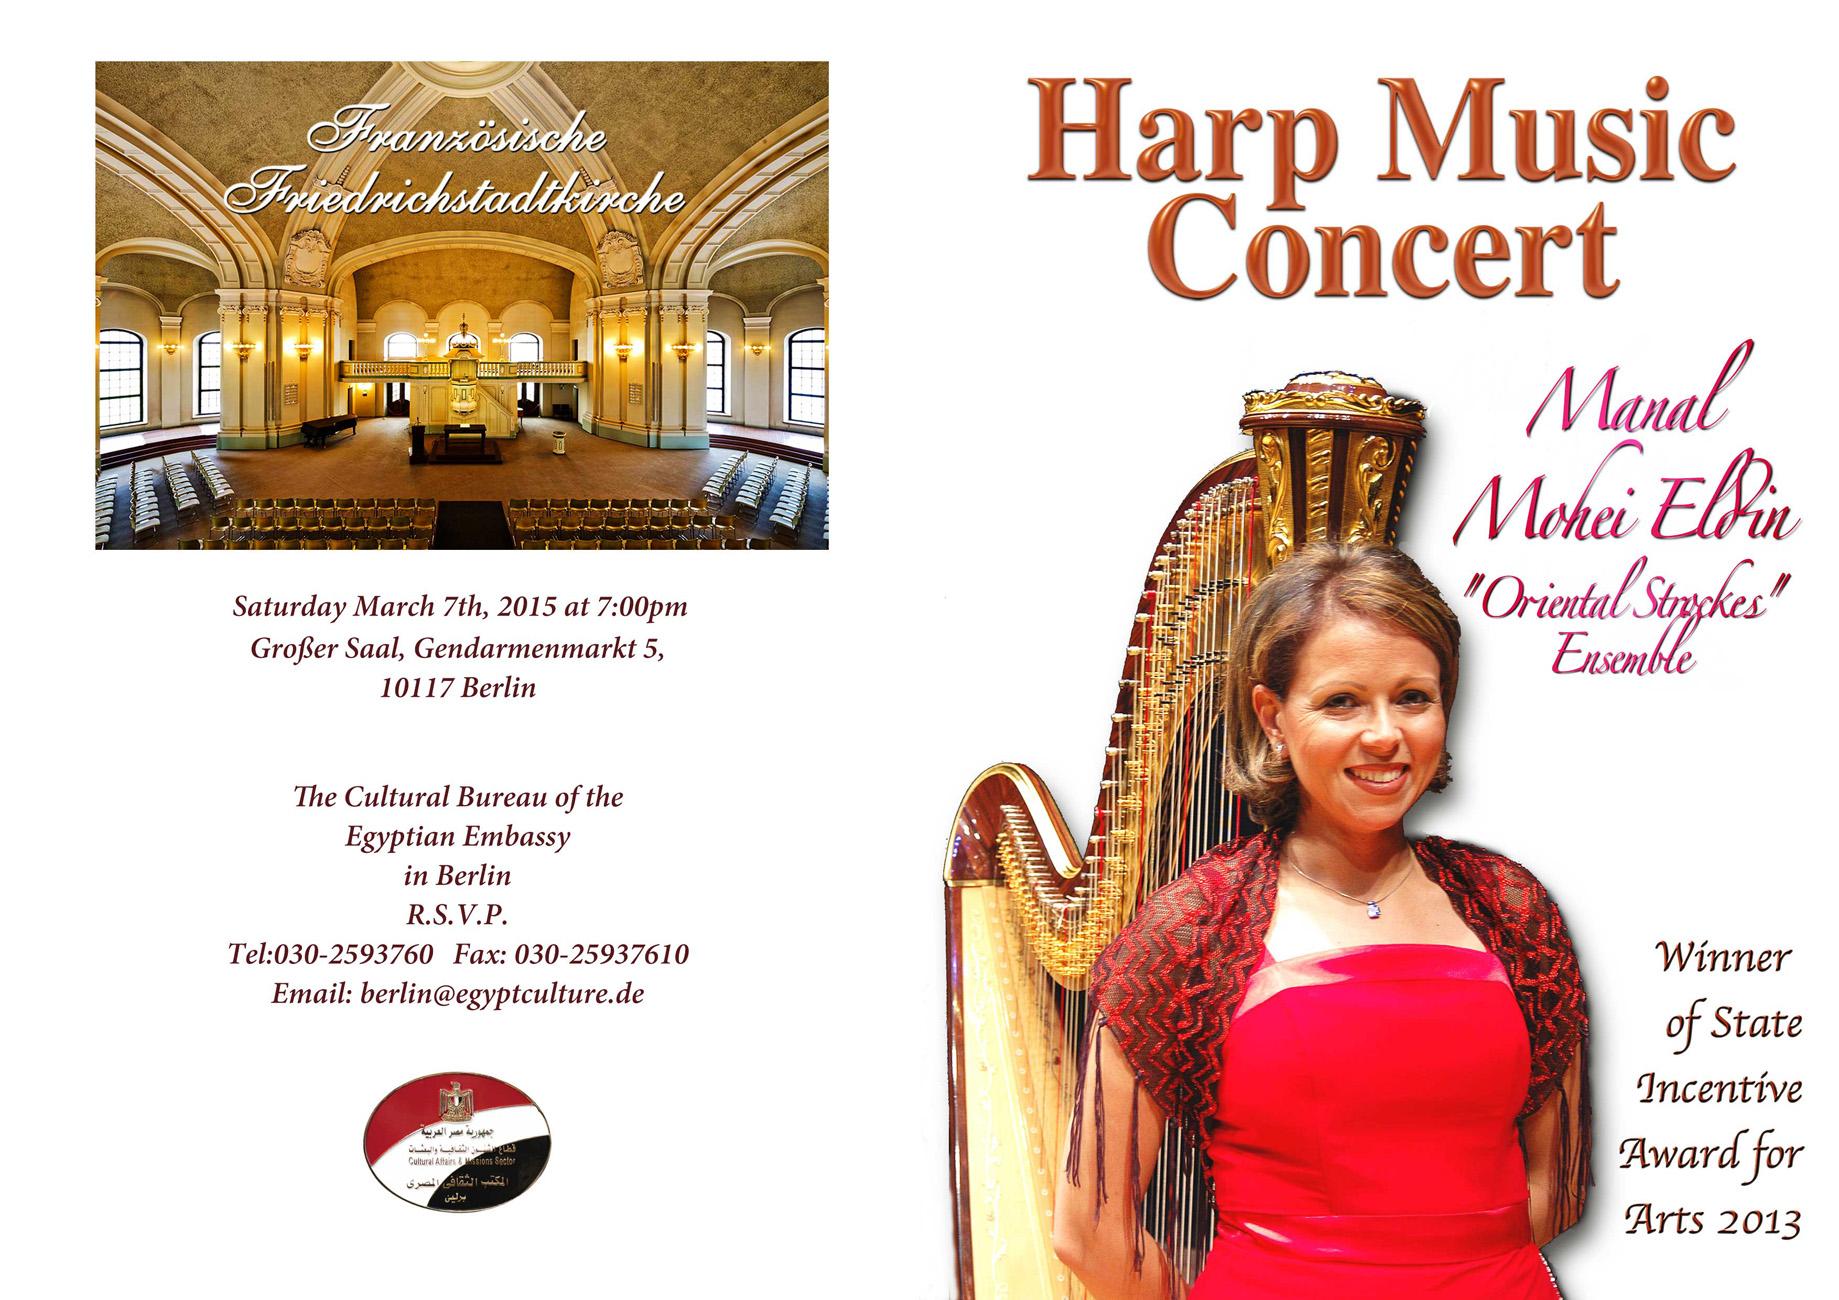 Harp Music Concert01